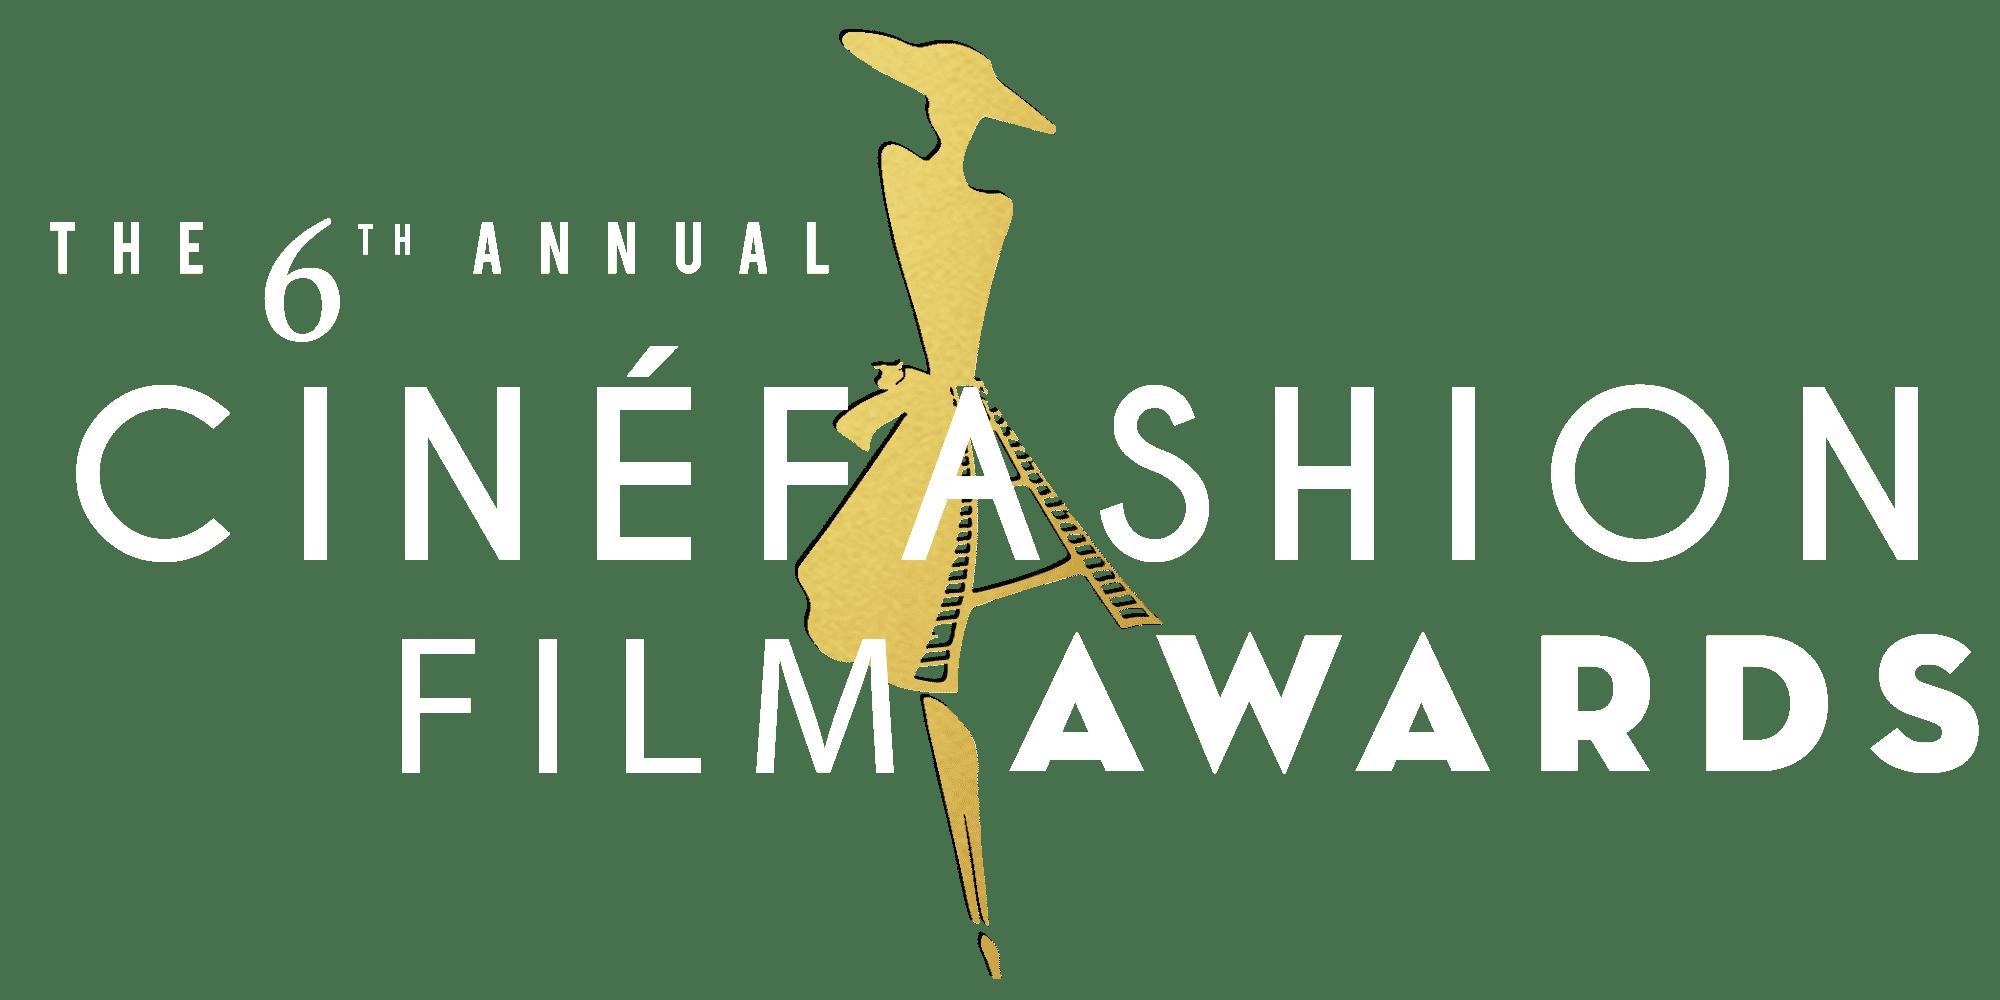 CineFashion Film Awards Logo